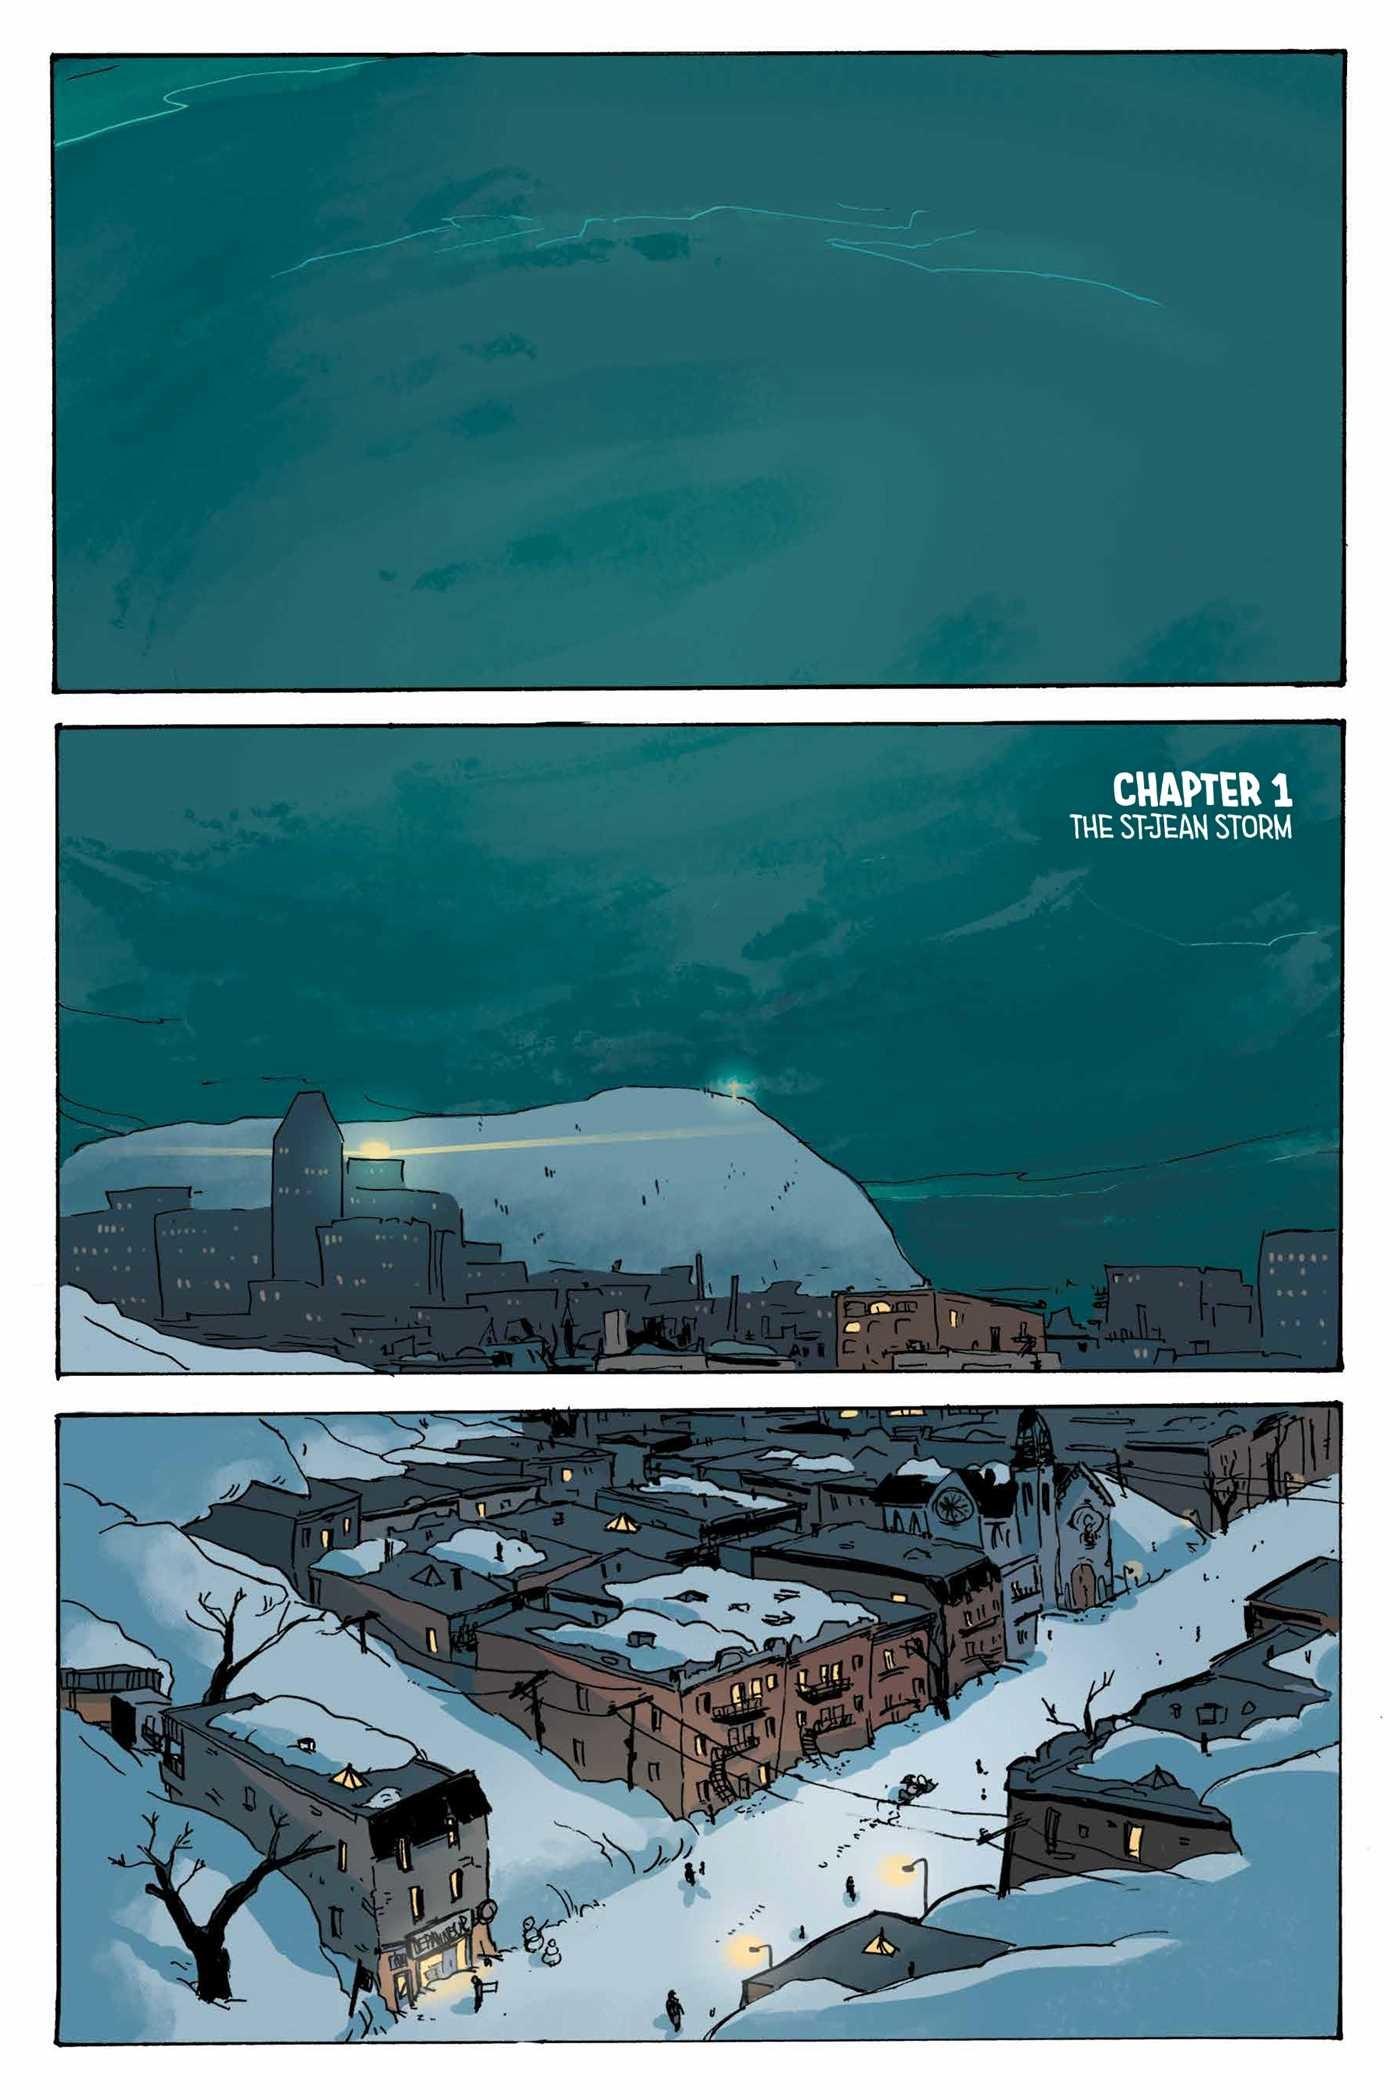 Nuclear winter vol 1 9781684151639.in01